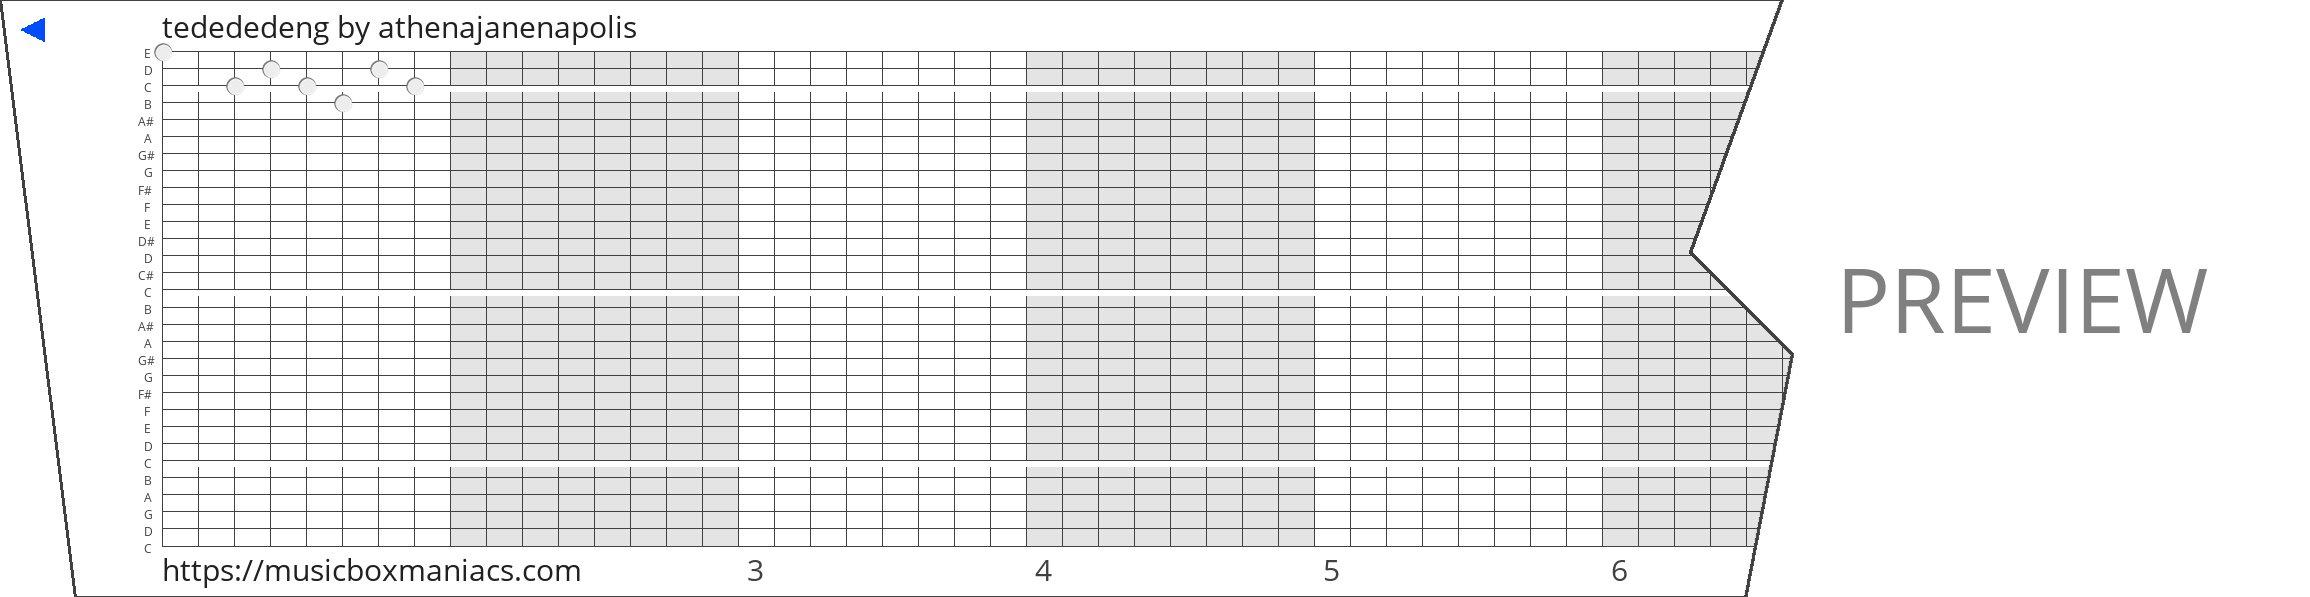 tedededeng 30 note music box paper strip